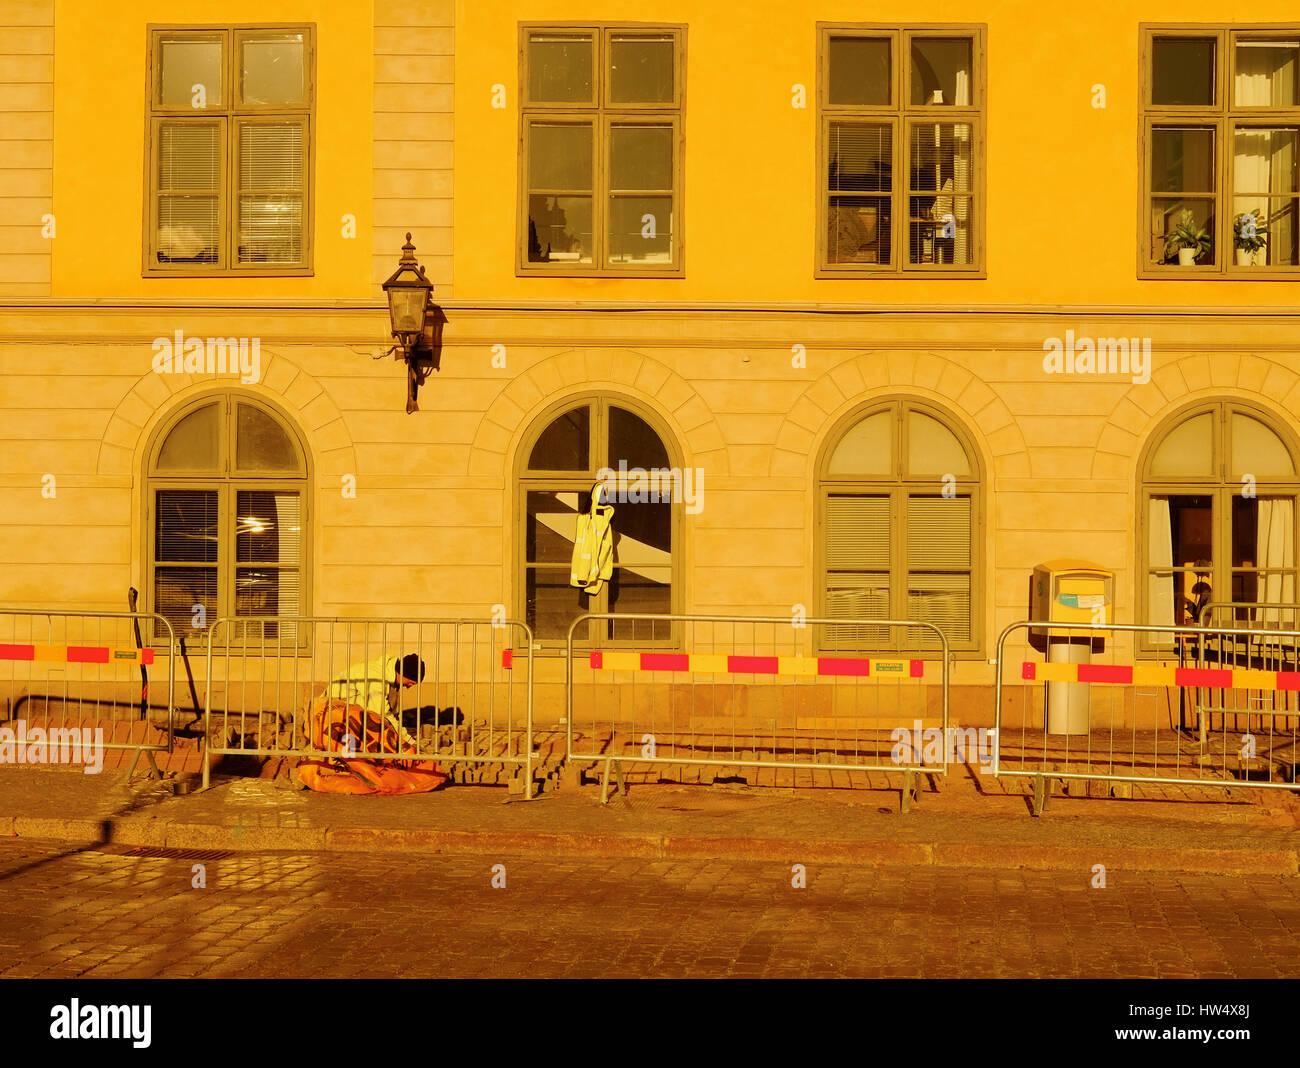 Workman in street bathed in dawn sunlight, Riddarholmen, Stockholm, Sweden, Scandinavia - Stock Image